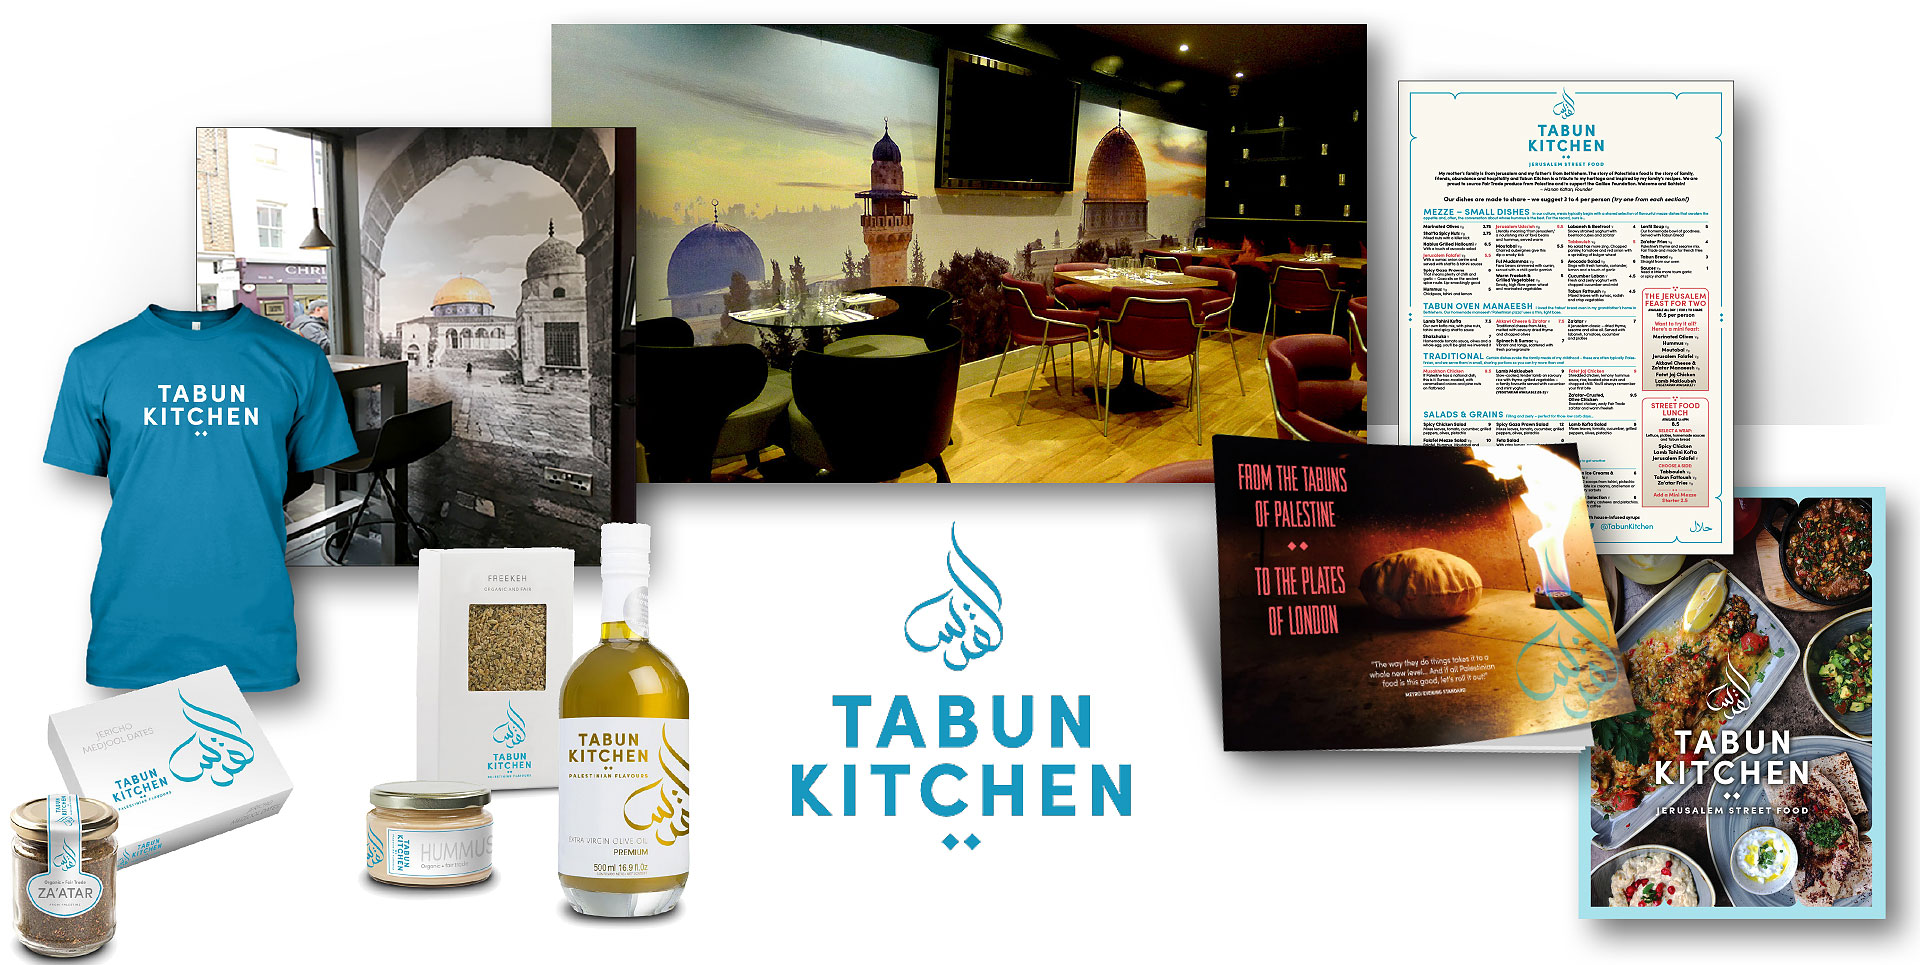 menu restaurant ads brand products wall art graphic alchemy